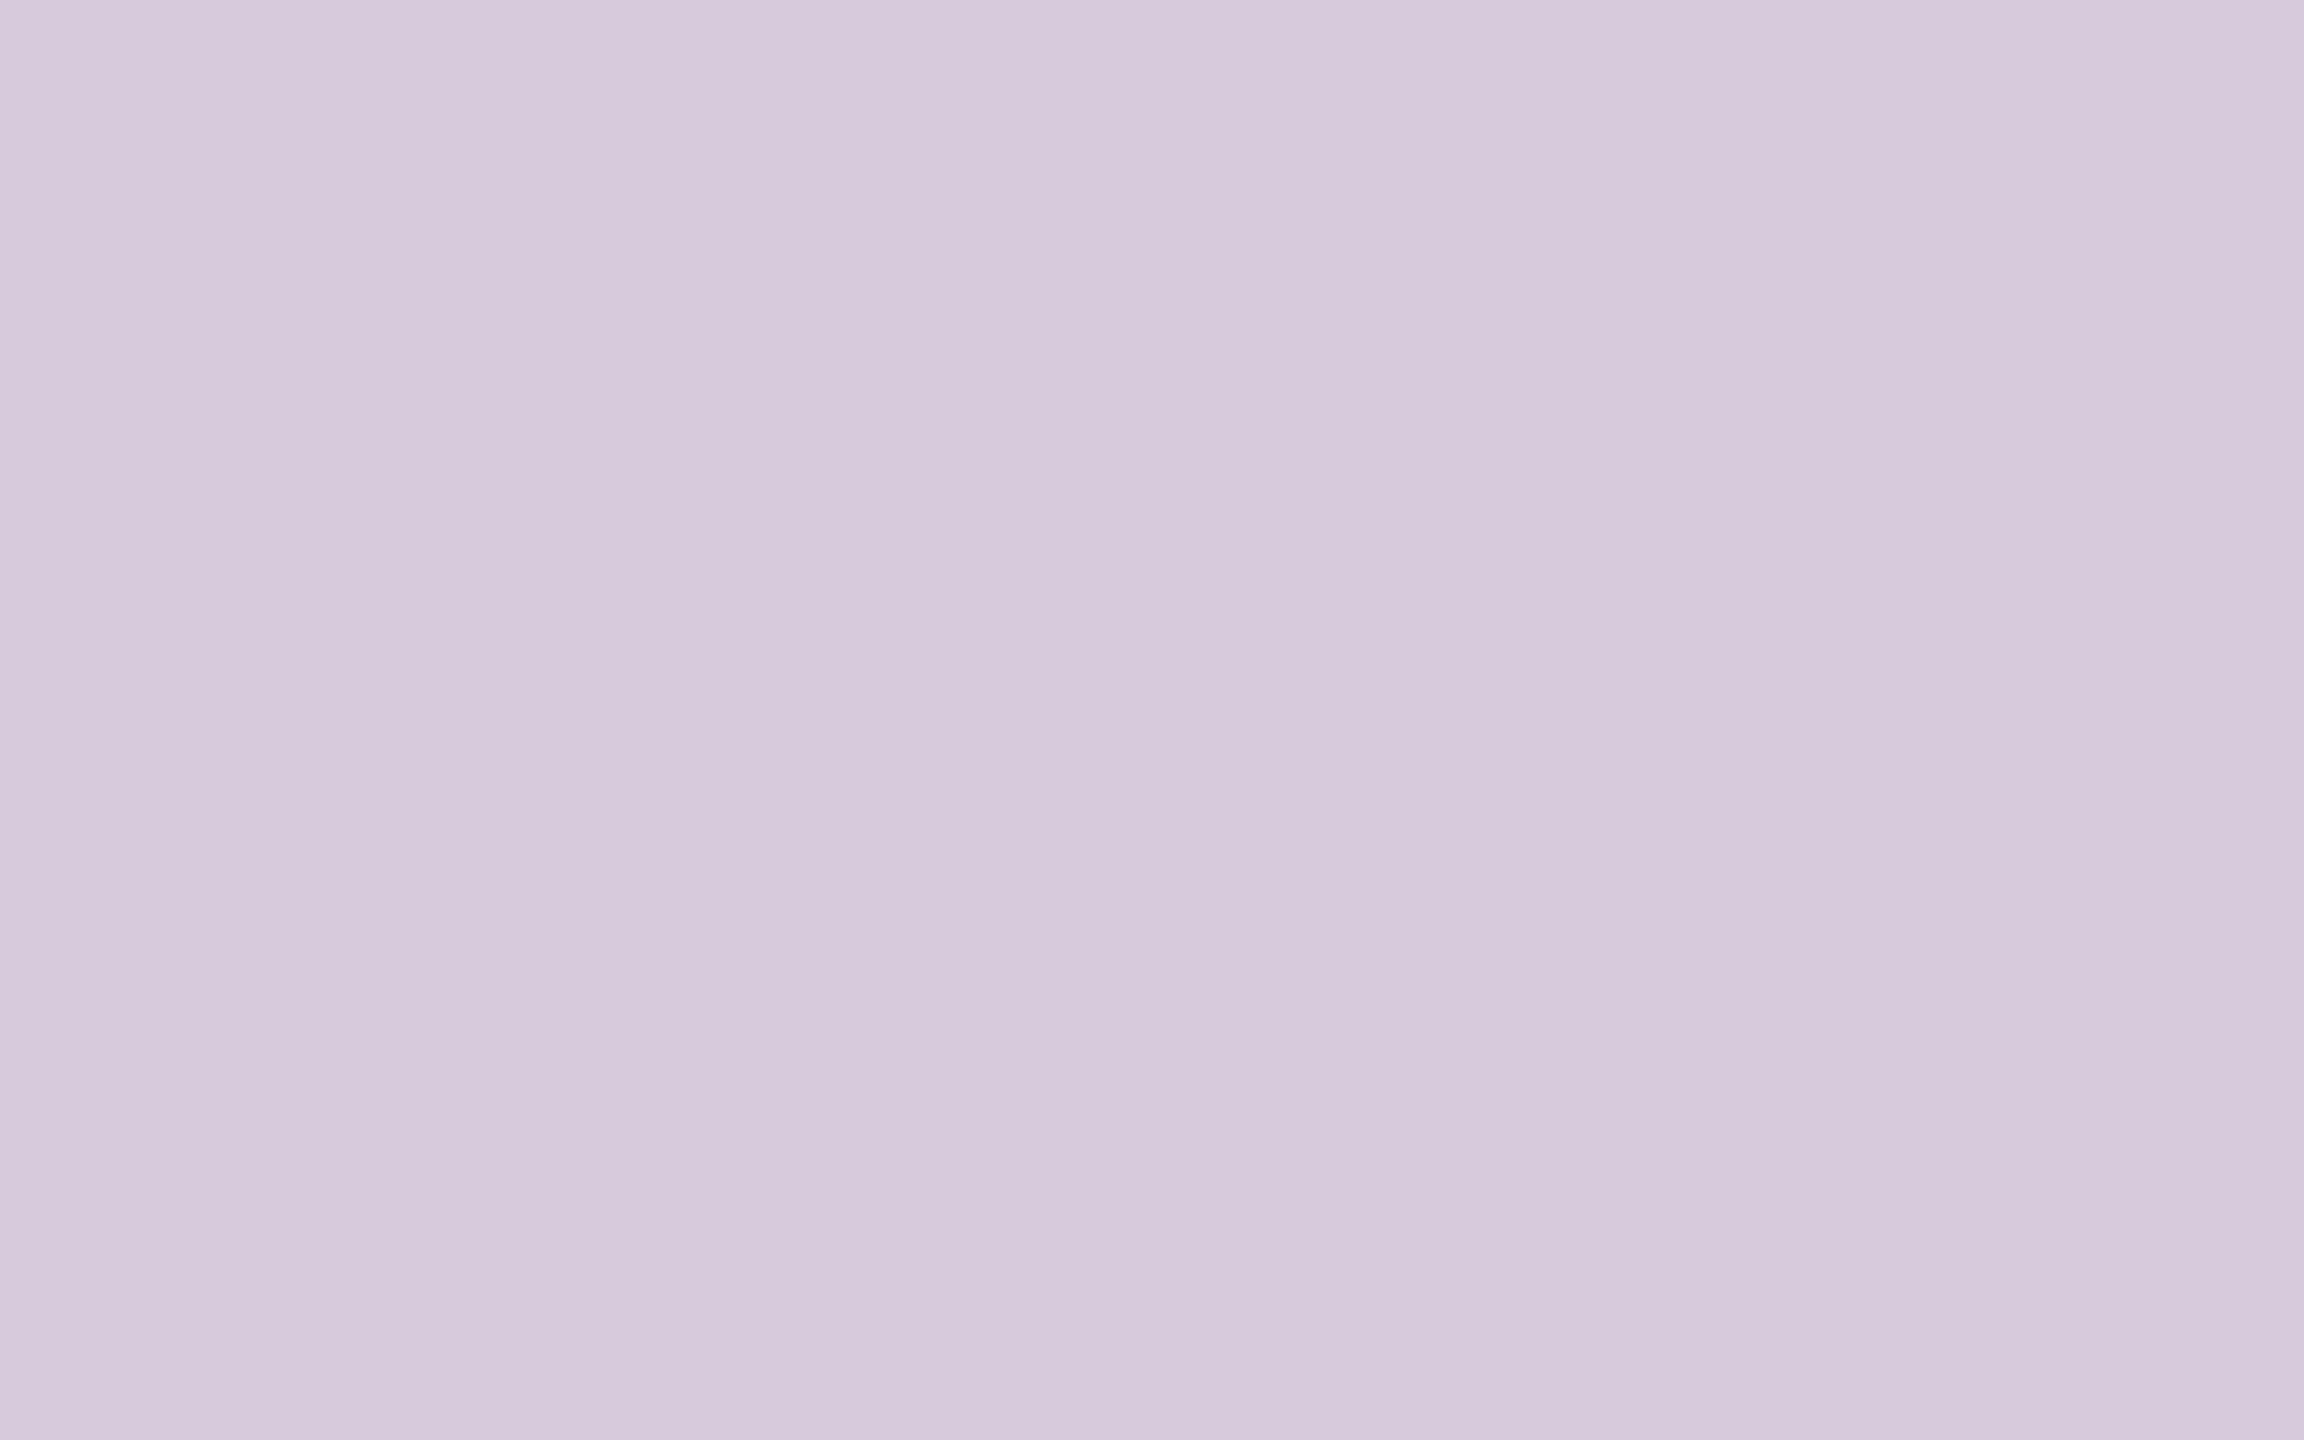 2304x1440 Languid Lavender Solid Color Background